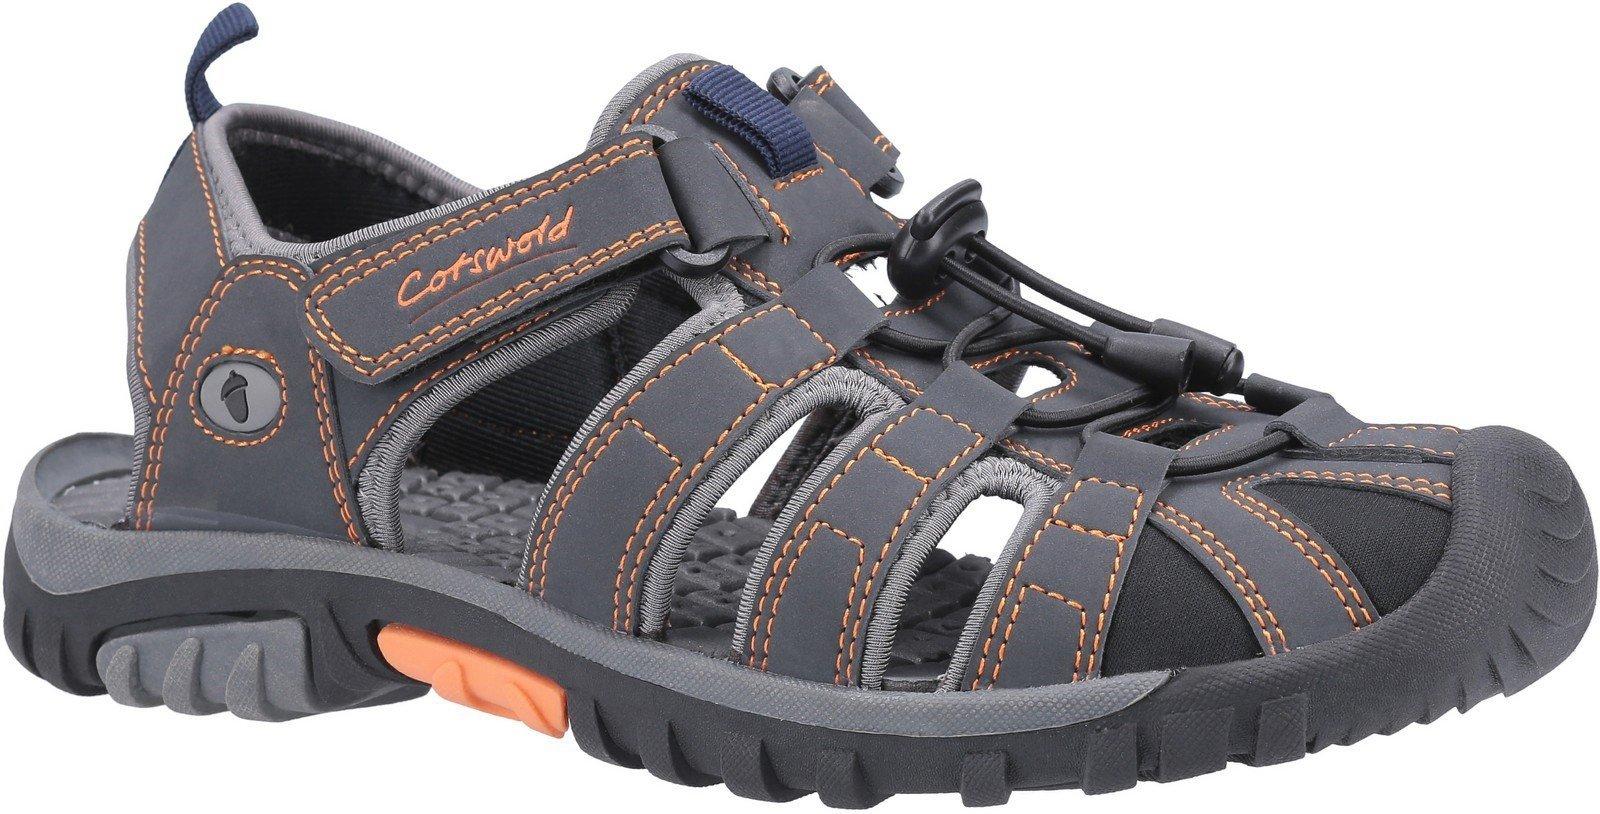 Cotswold Men's Sandhurst Touch Fastening Sandal Various Colours 30160 - Grey/Orange 7